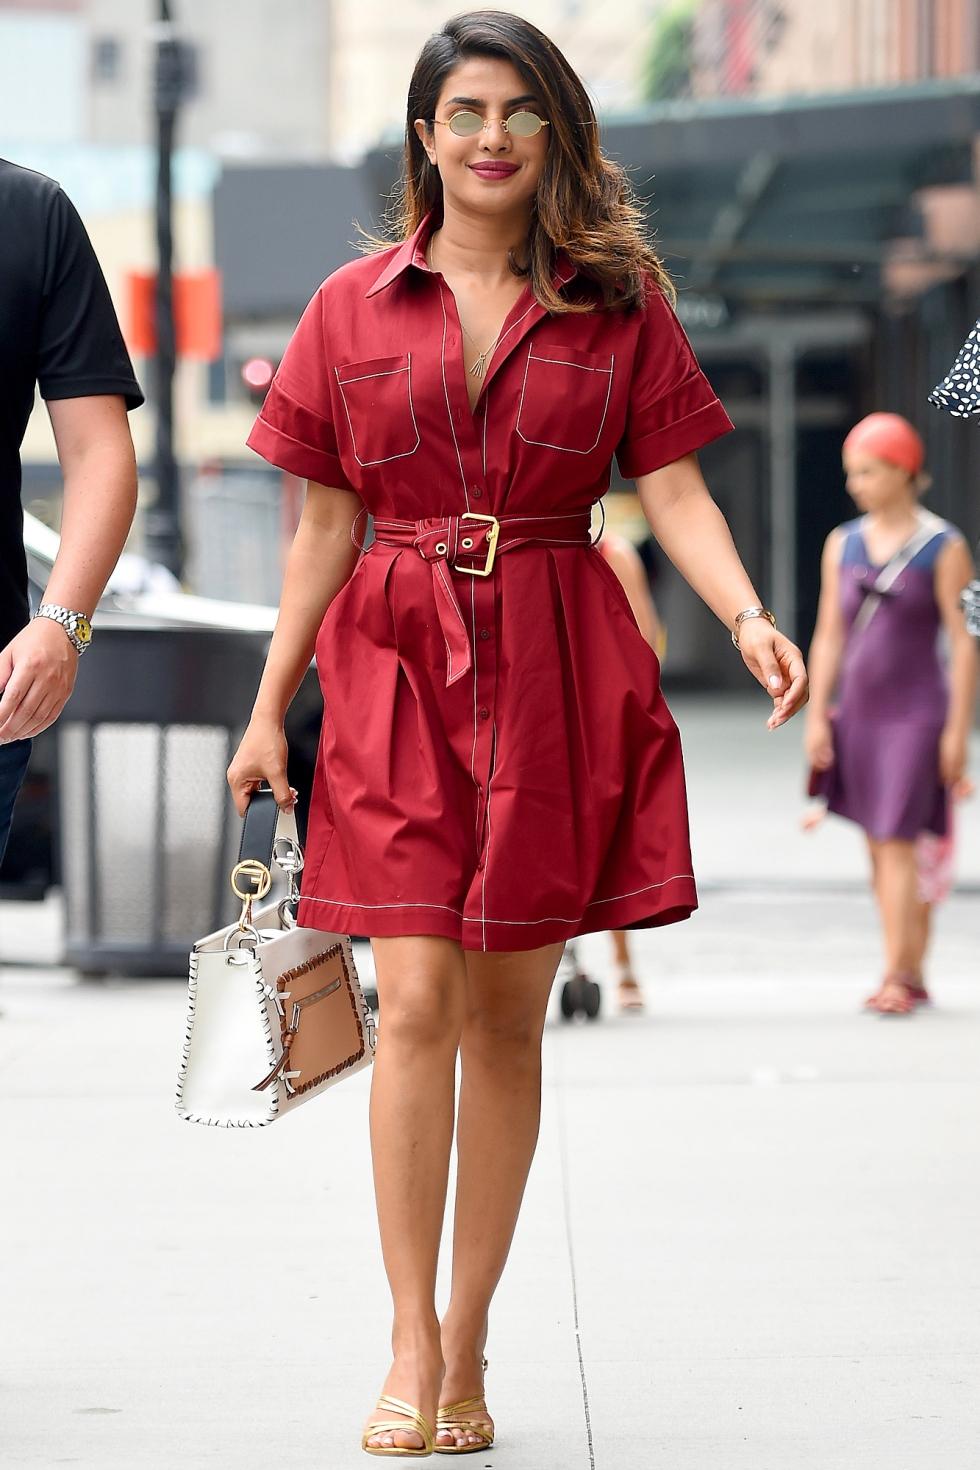 Priyanka Chopra wears a red dress in New York City